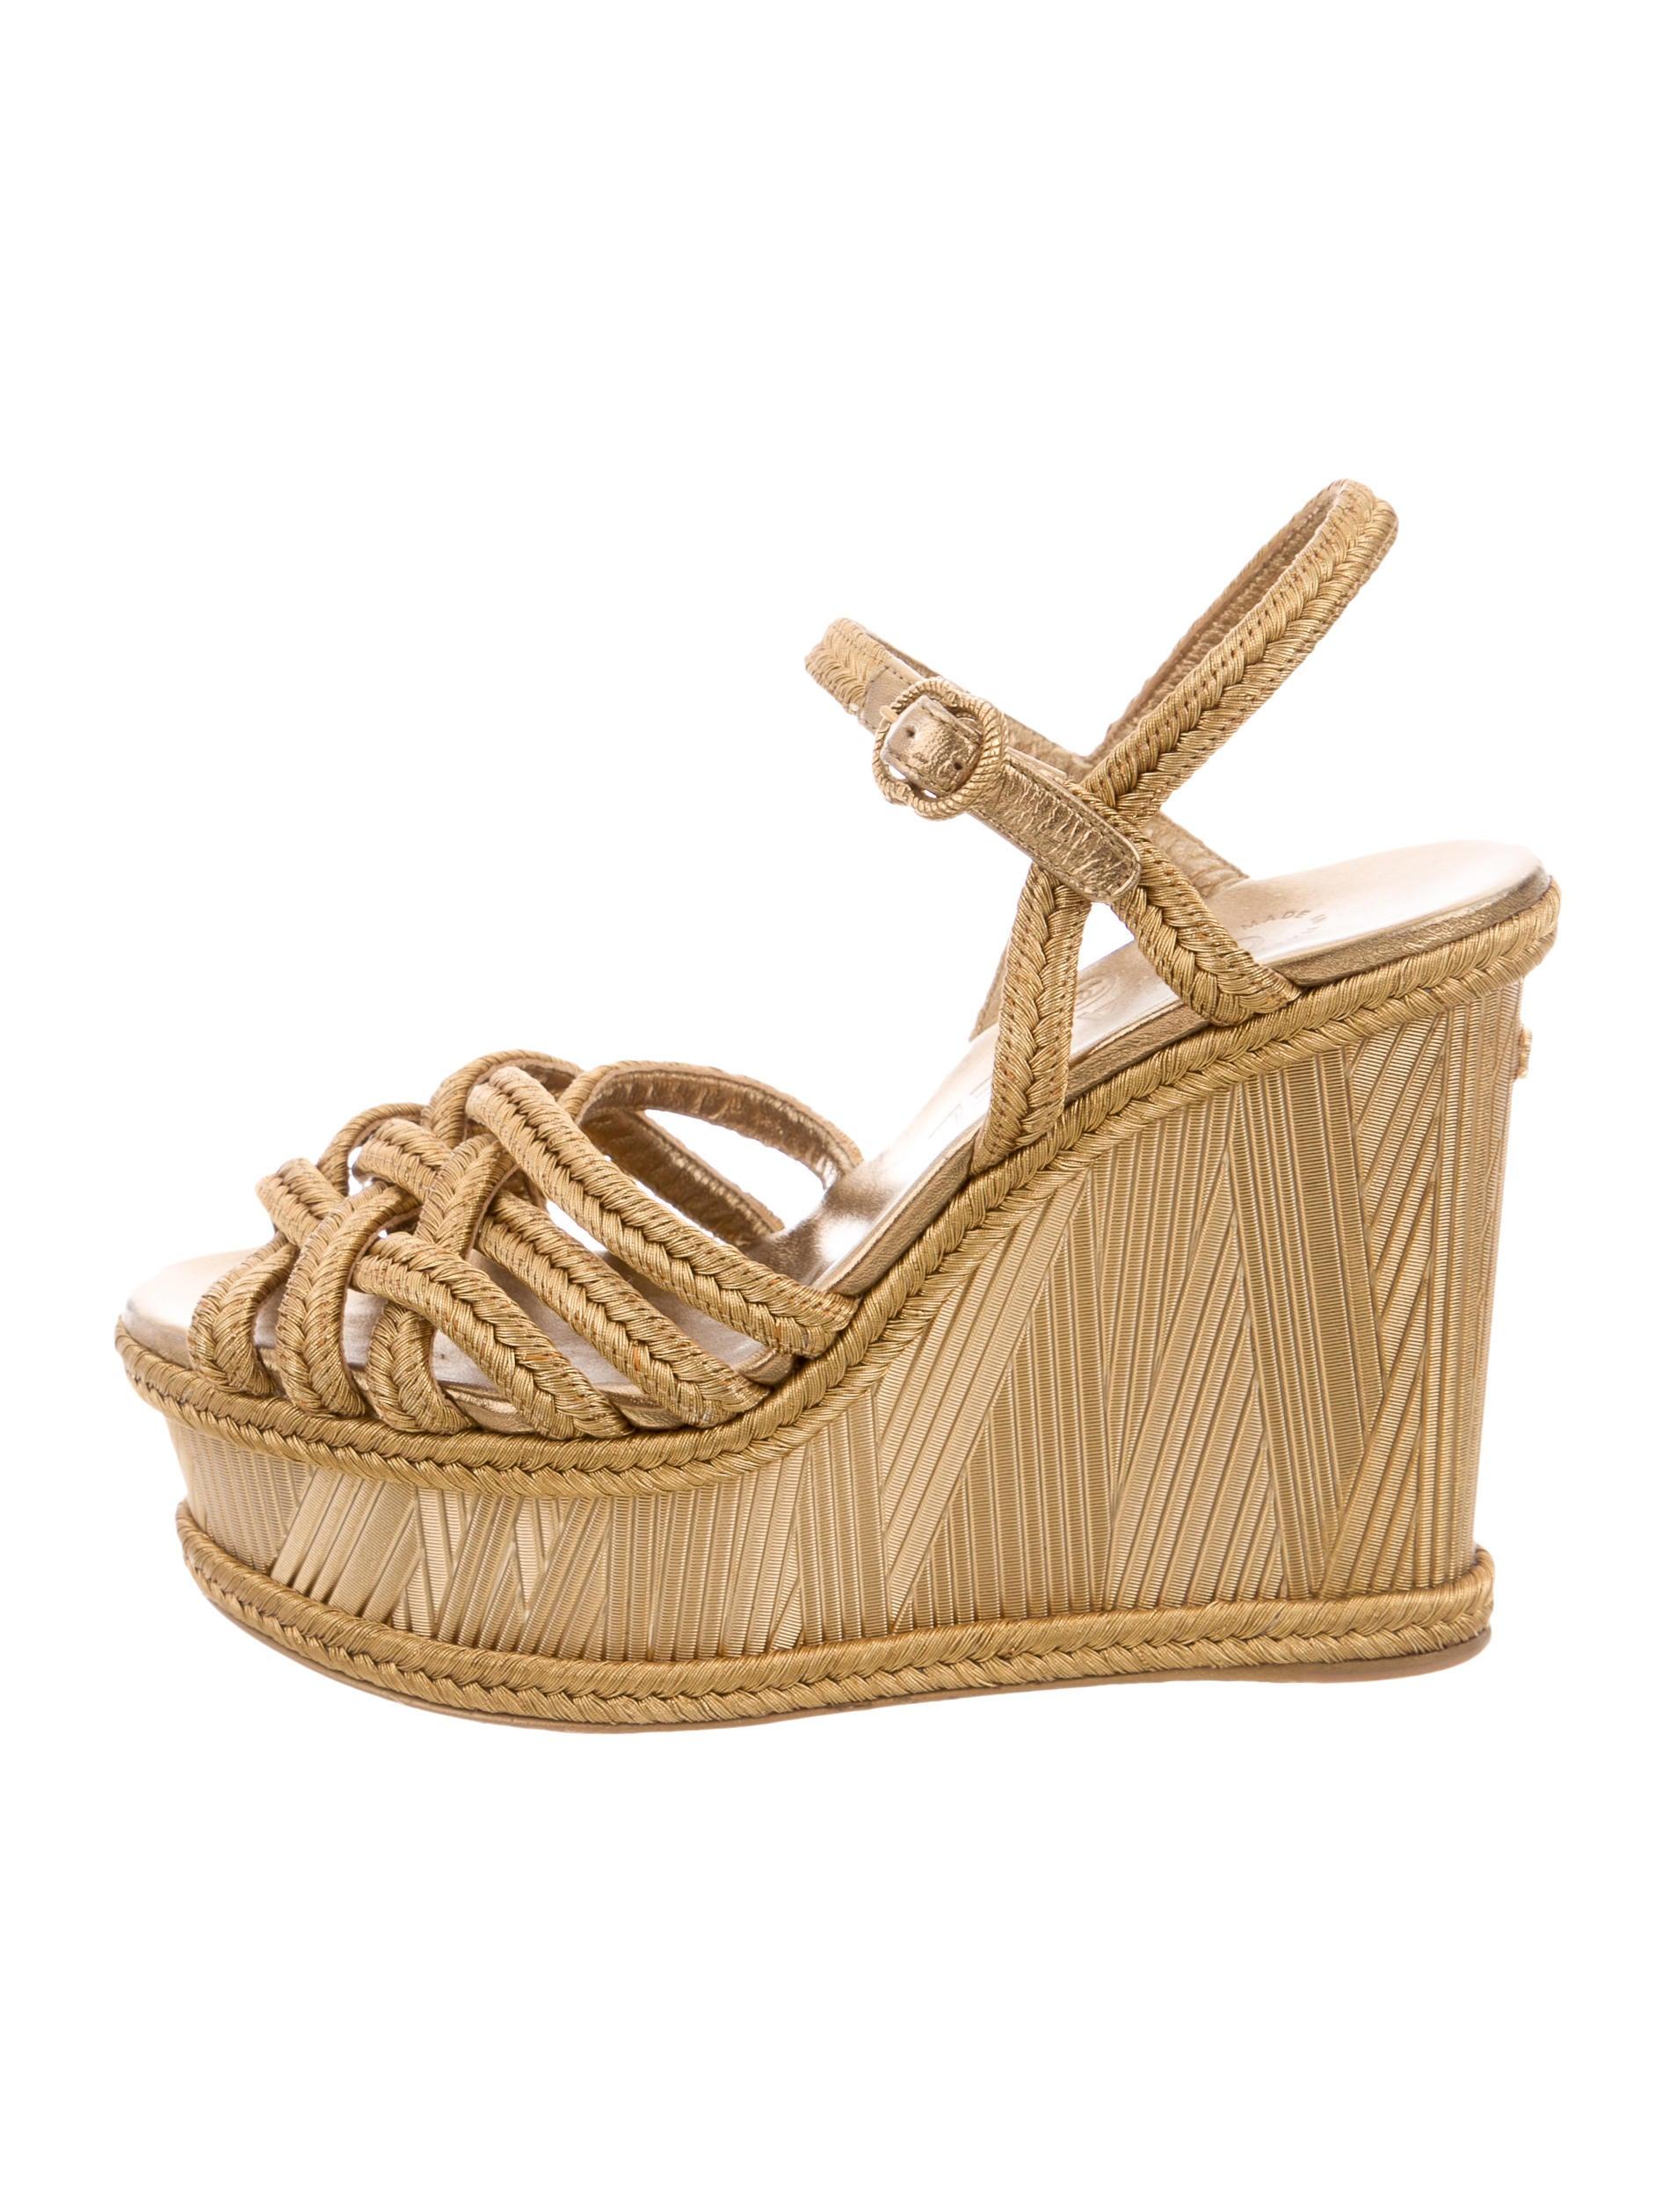 chanel metallic platform wedges shoes cha128318 the